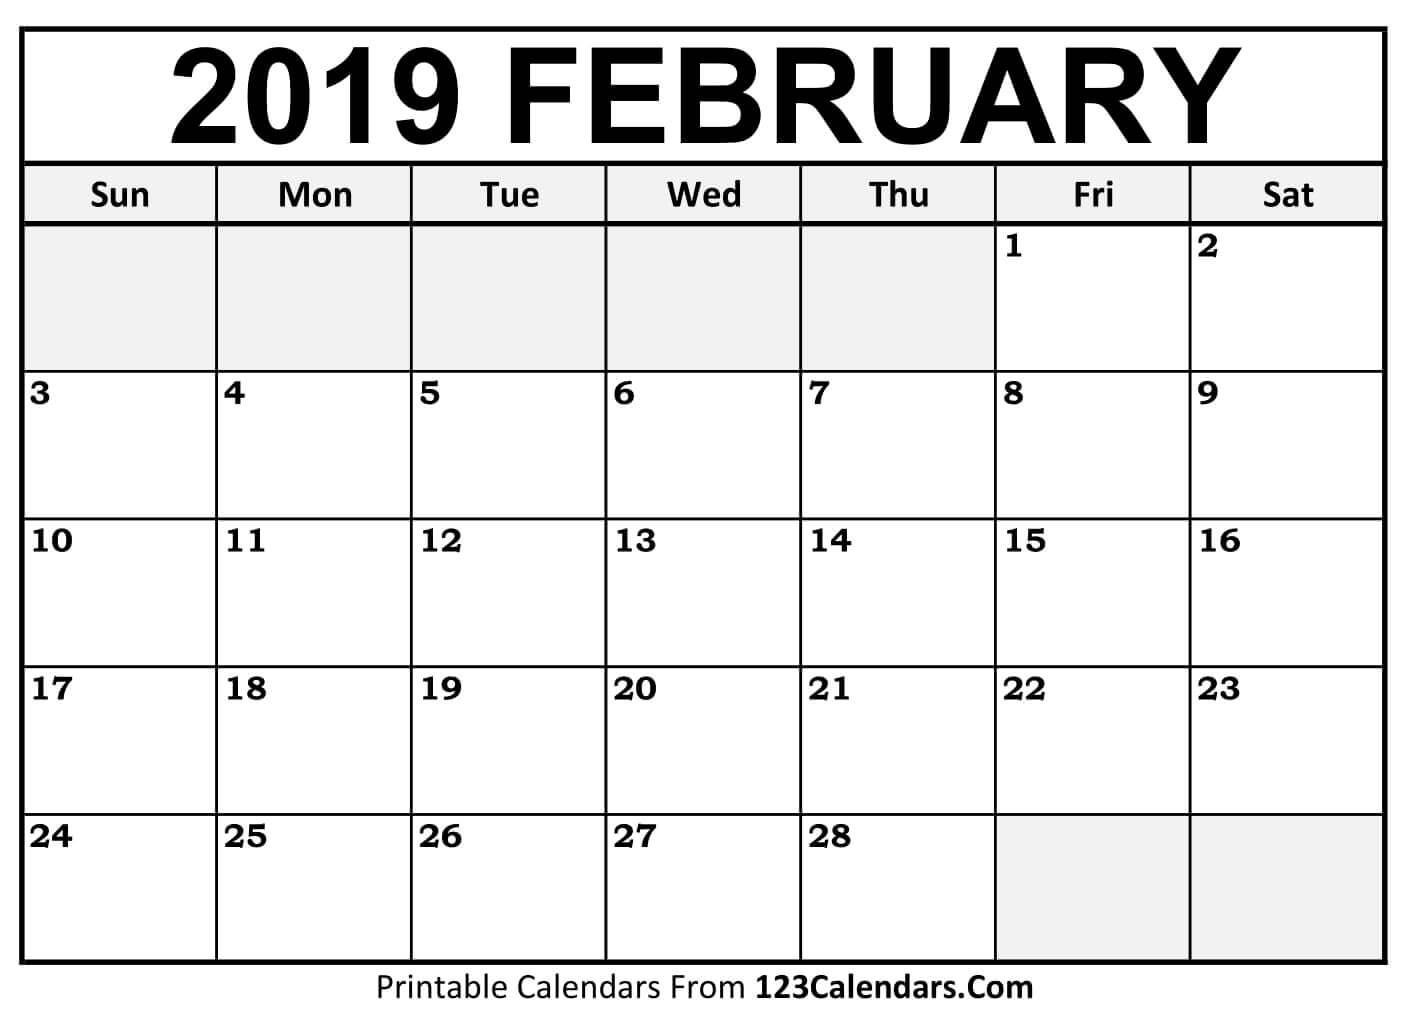 Feb 2019 Calendar